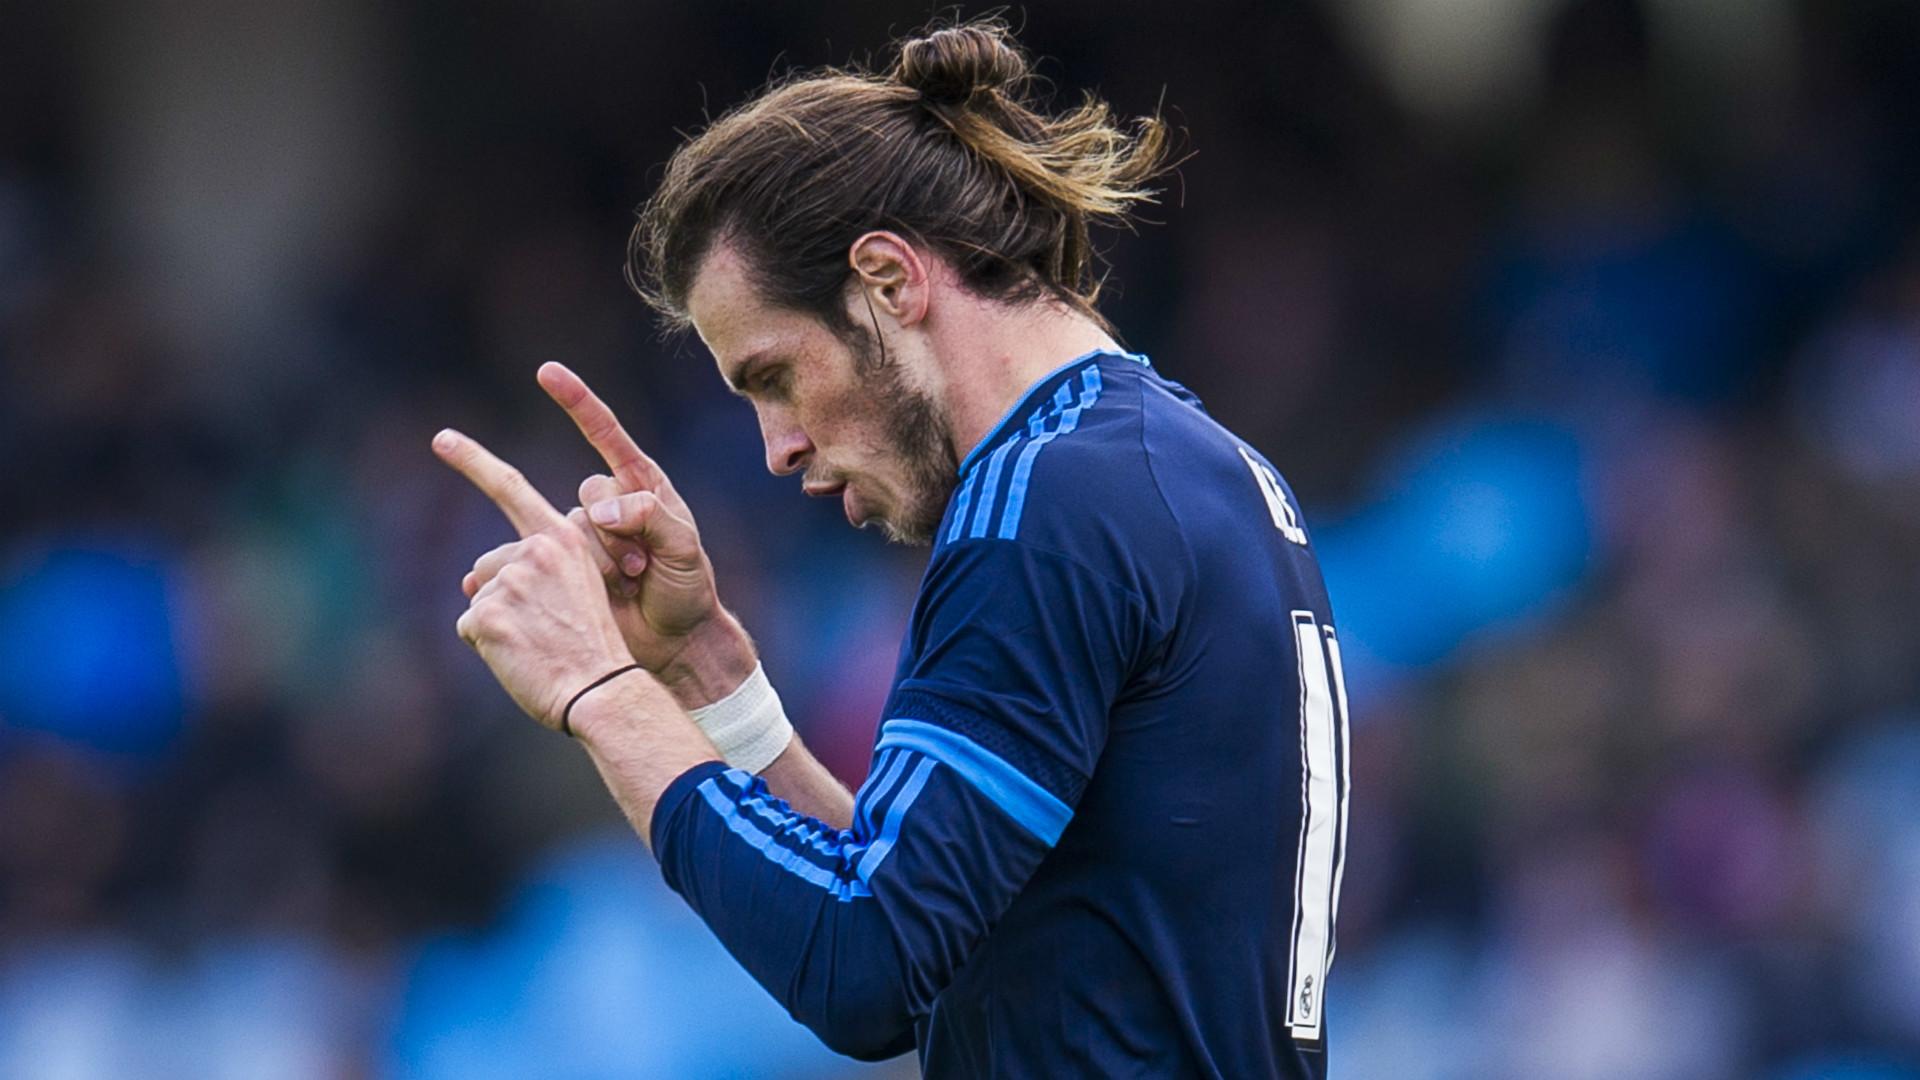 Messi 3d Wallpaper 2017 Gareth Bale Wallpaper 2018 Hd 79 Images